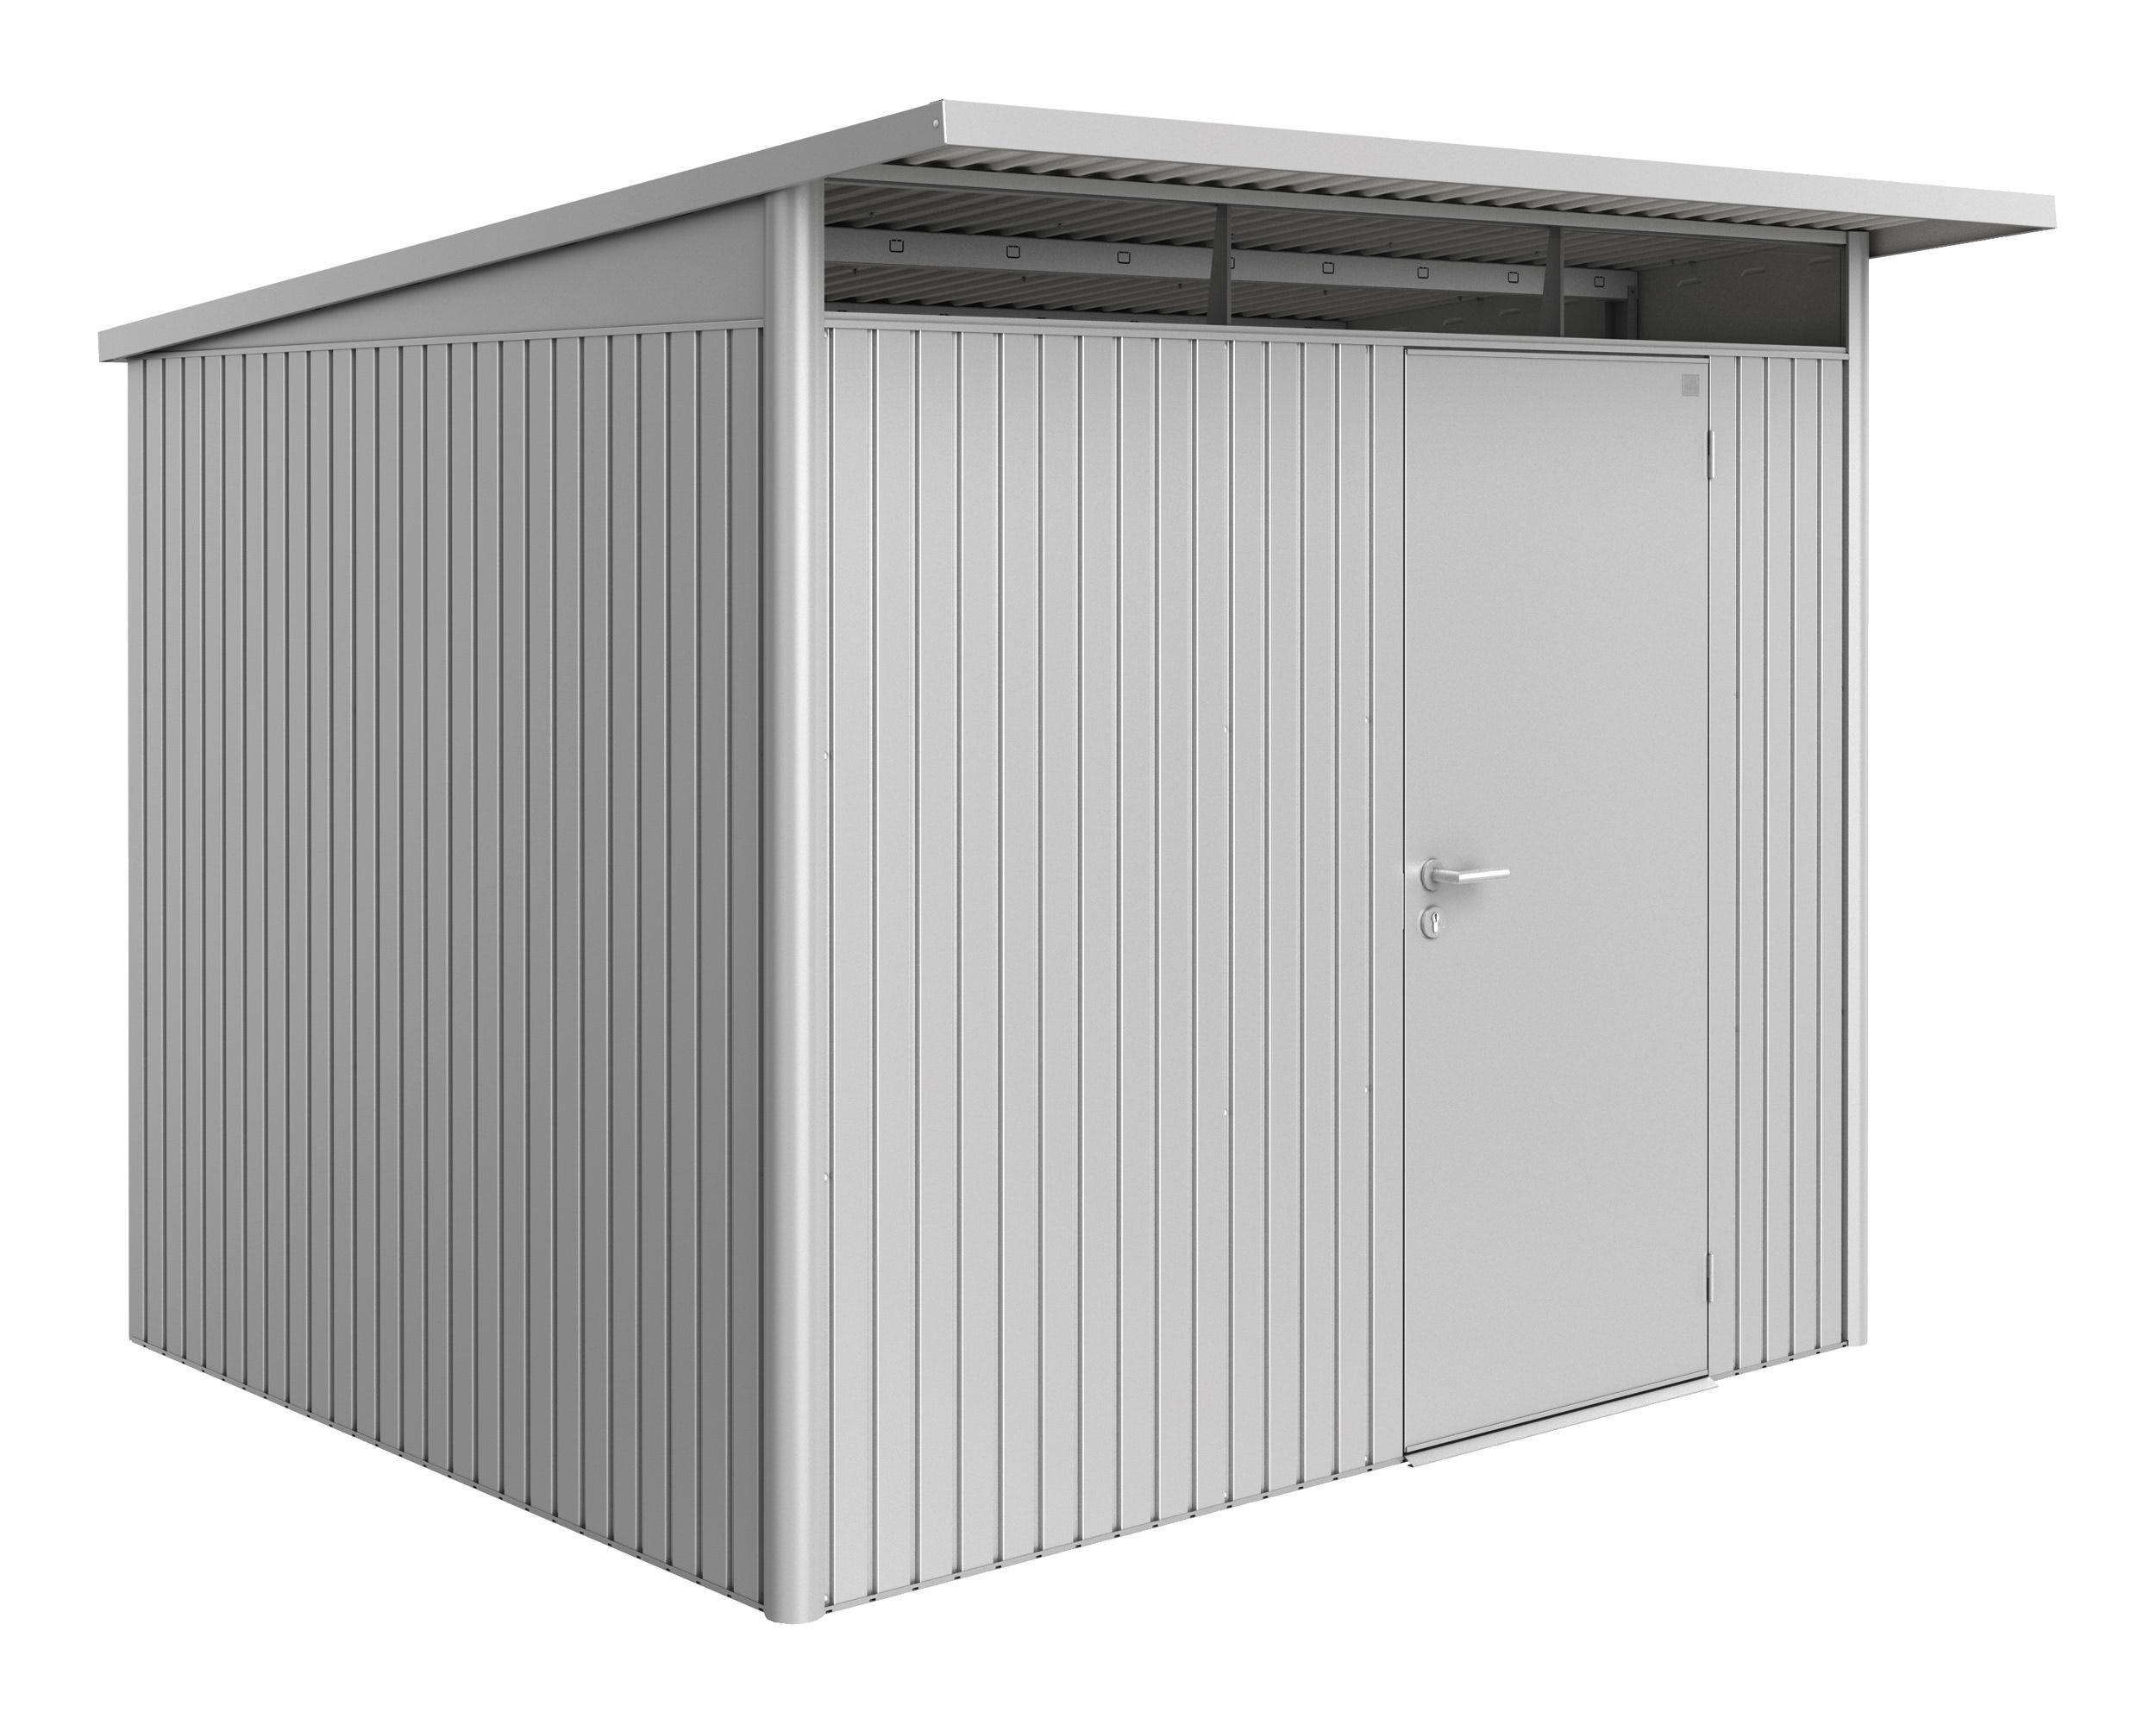 Gerätehaus Avantgarde A6, Standardtüre